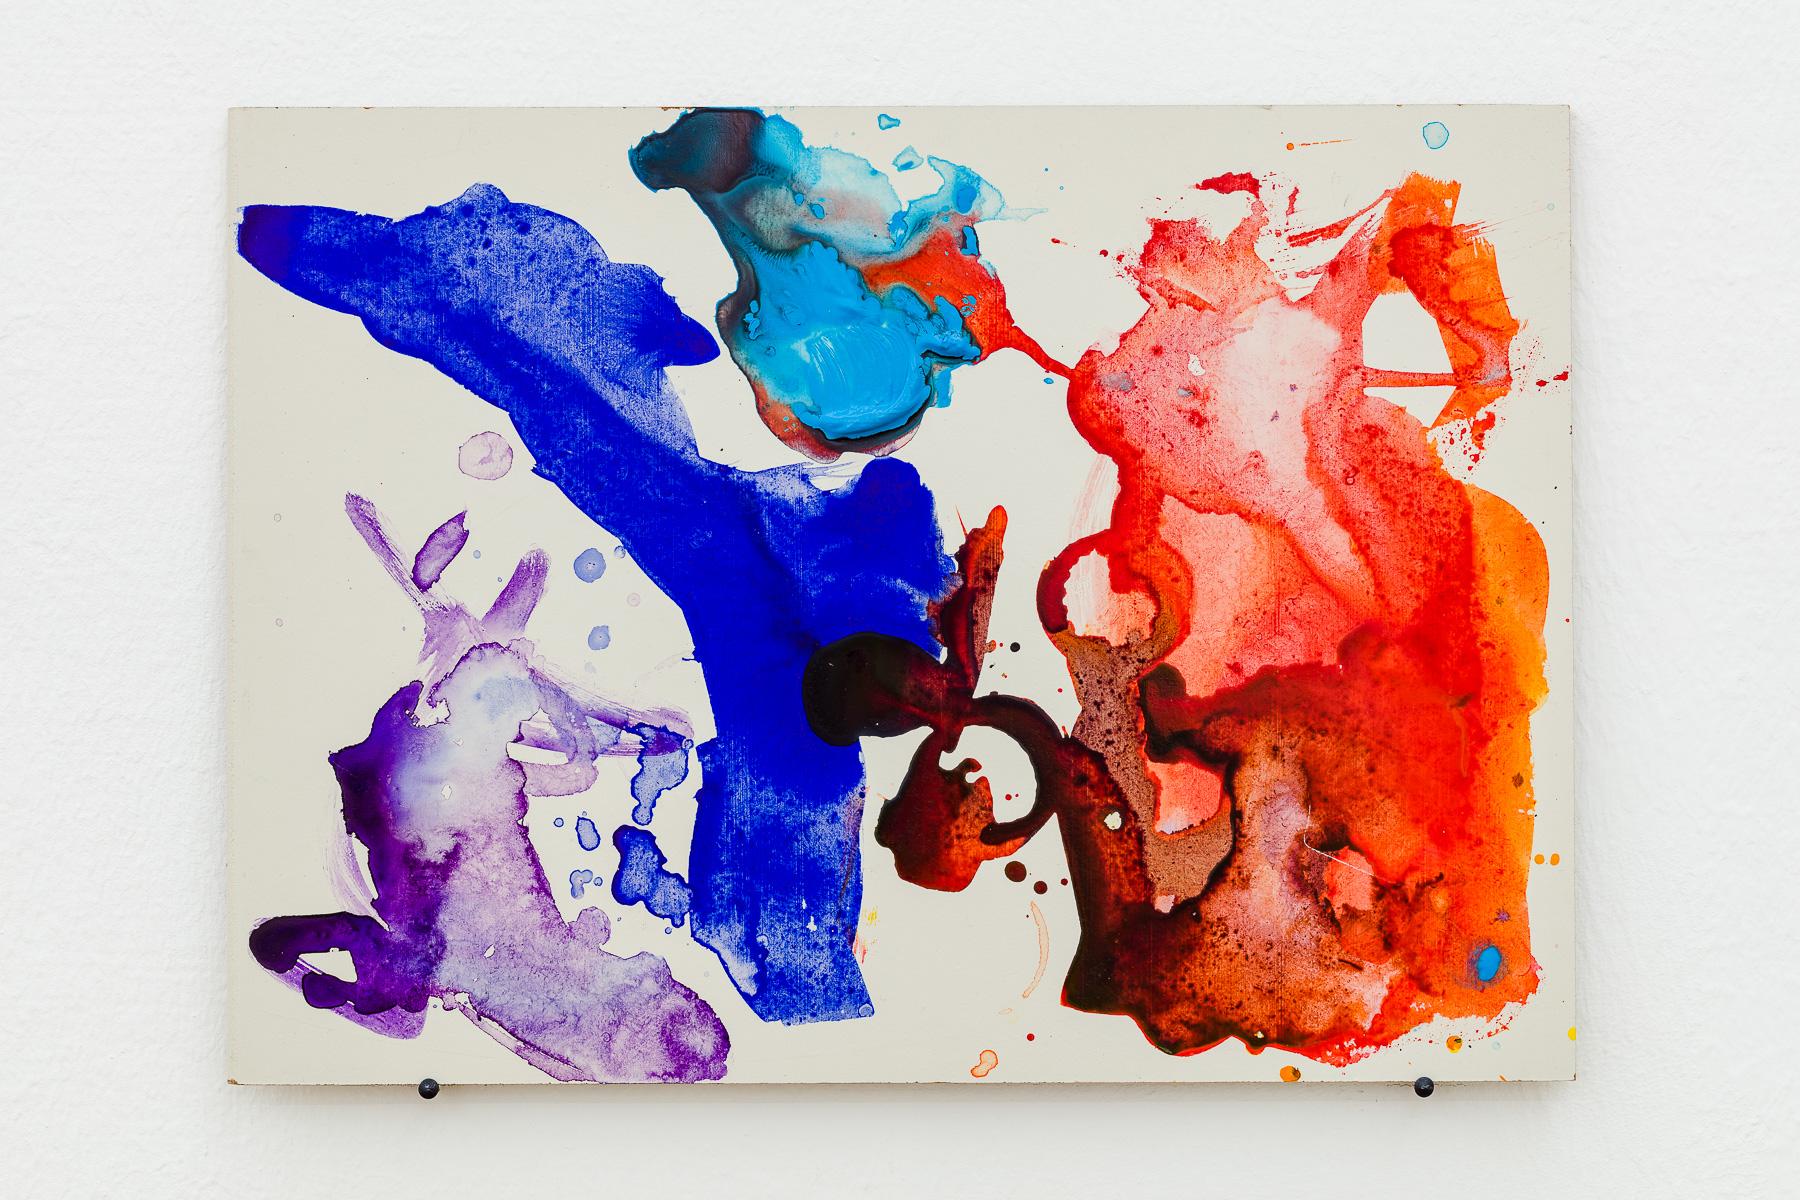 2019_05_20_Elke-Krystufek_Croy-Nielsen_by-kunst-dokumentation-com_011_web.jpg